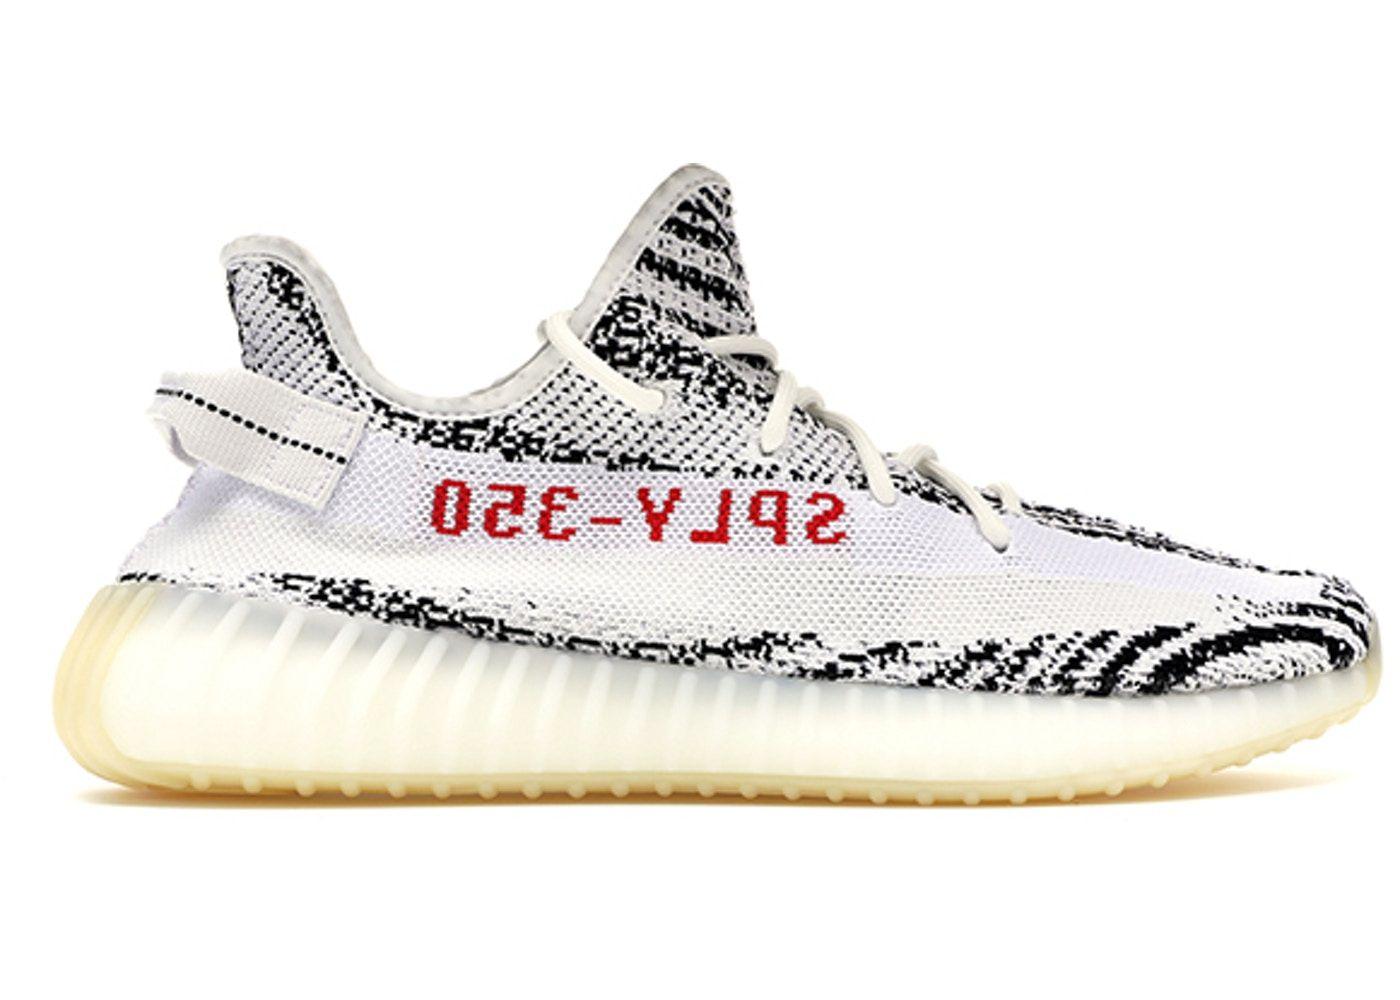 adidas yeezy schoenen